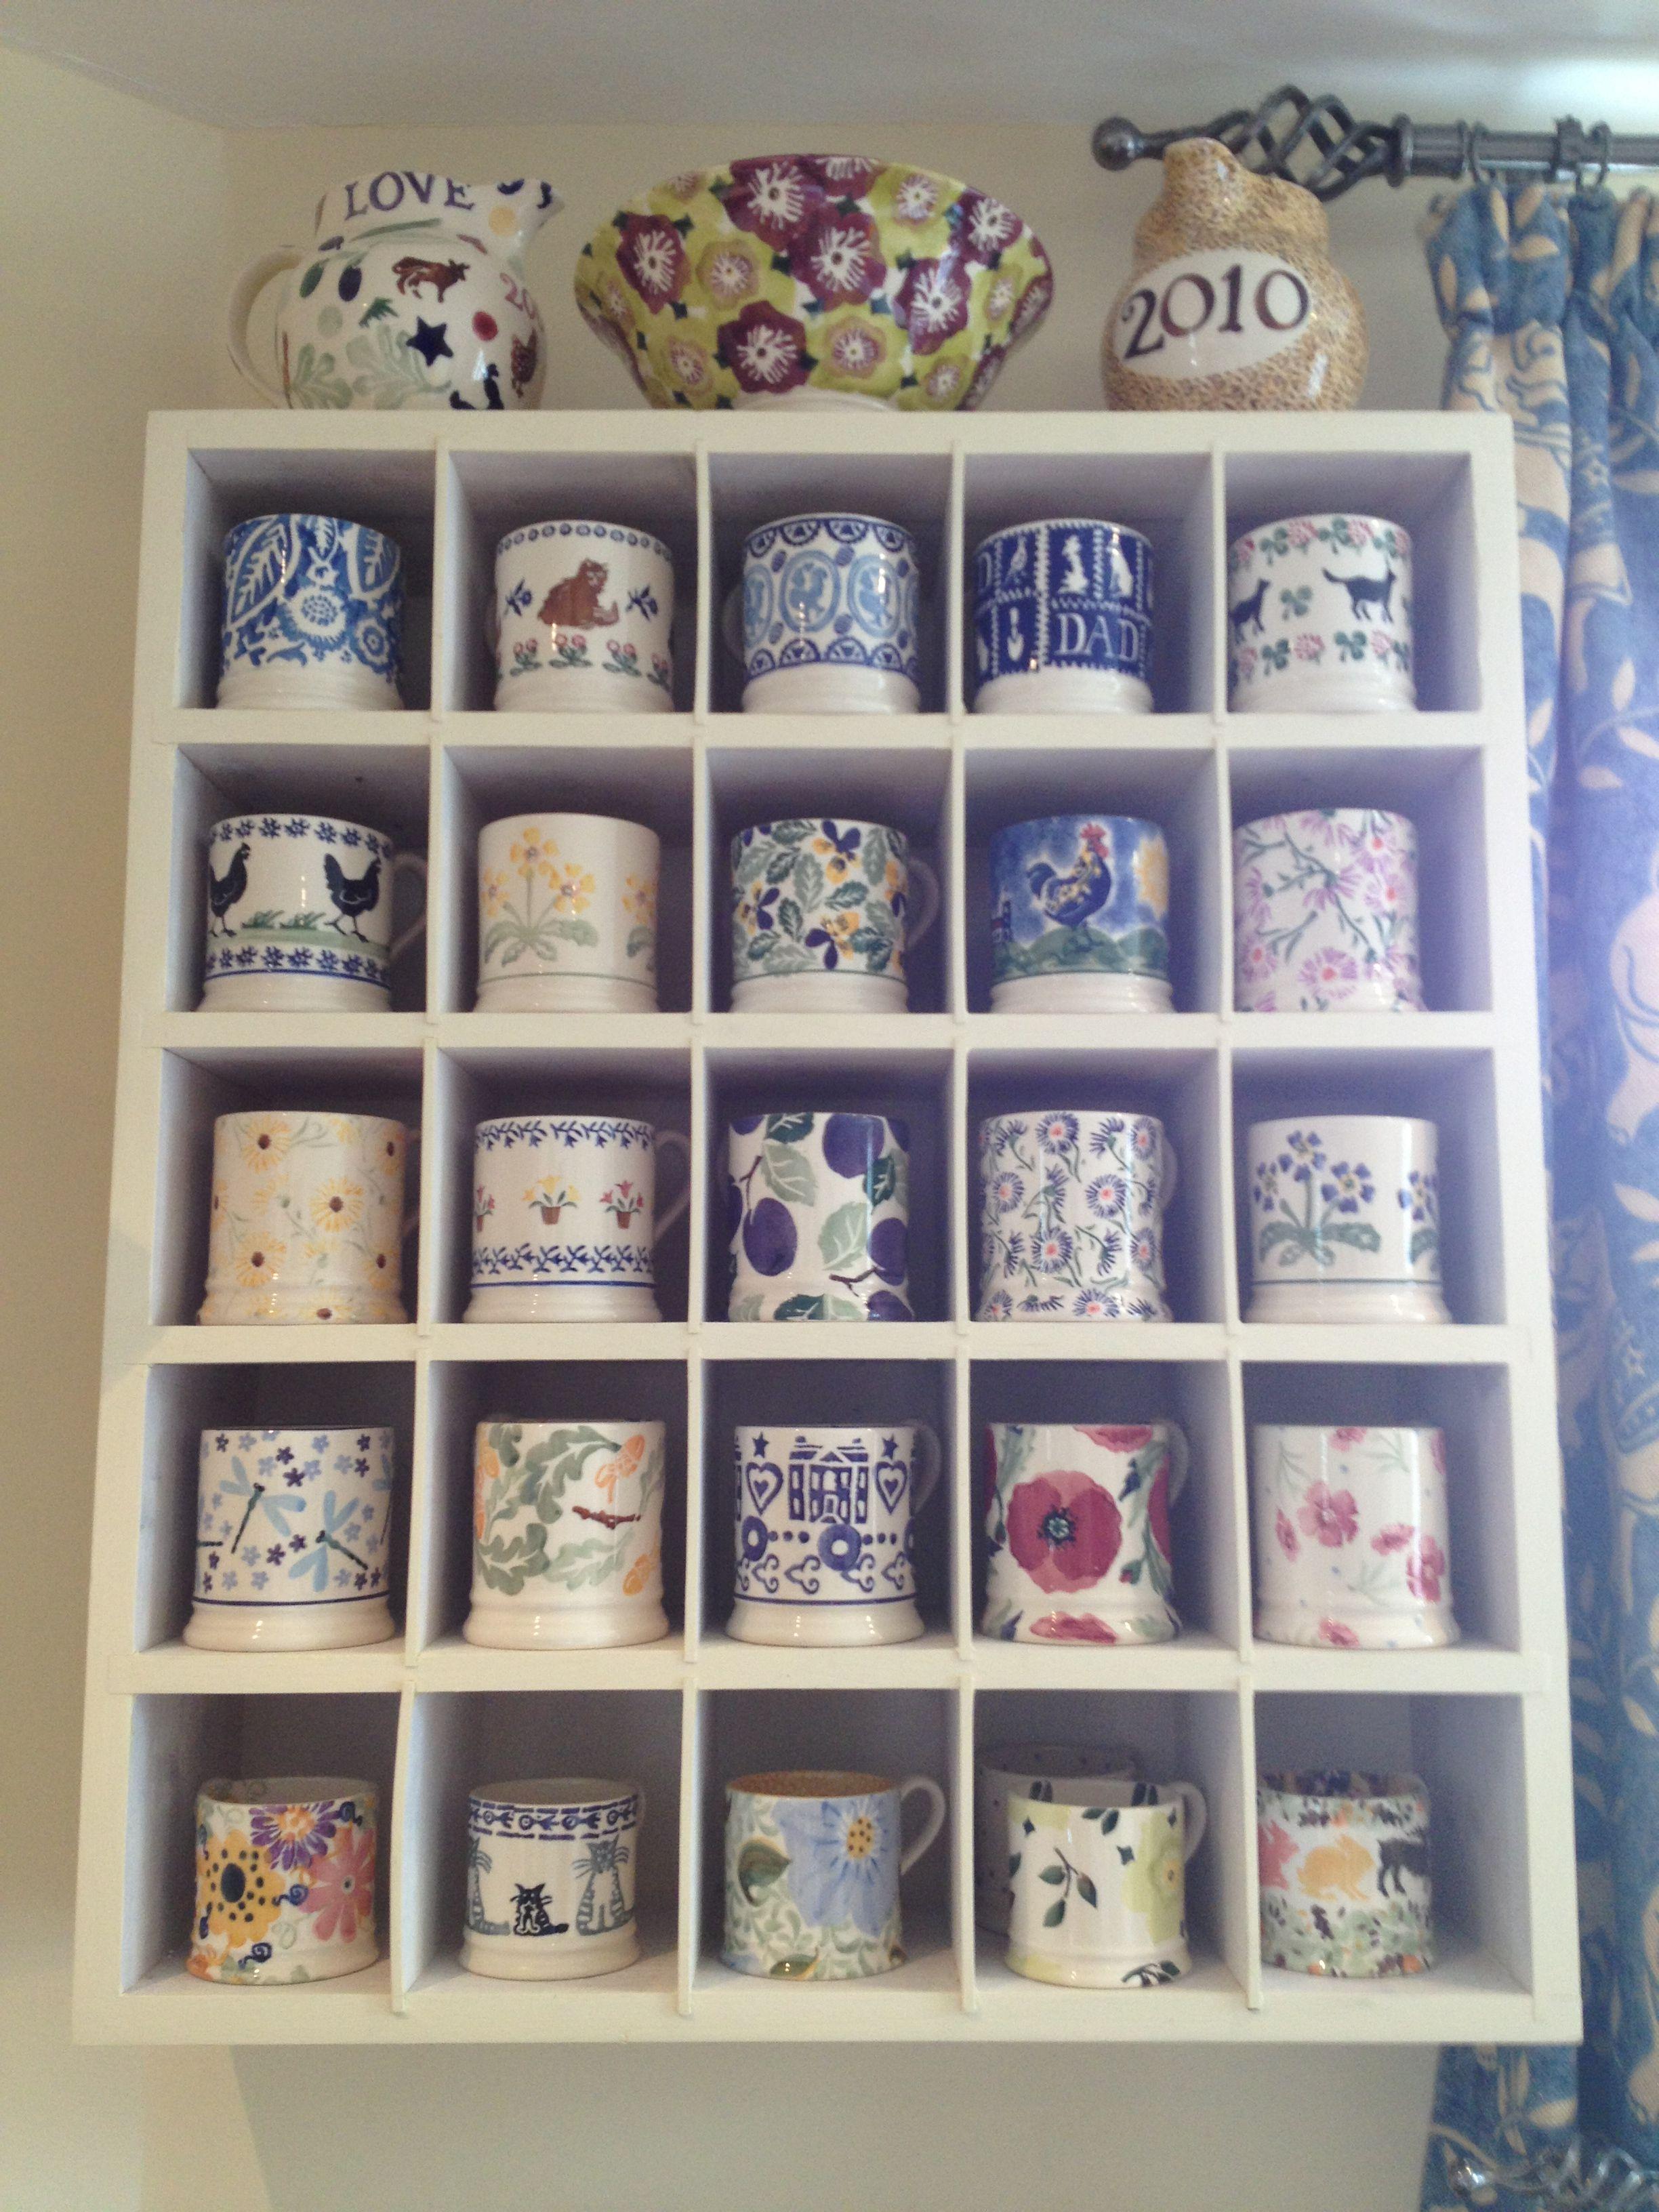 Bridgewater mug collection. Ooh lovely